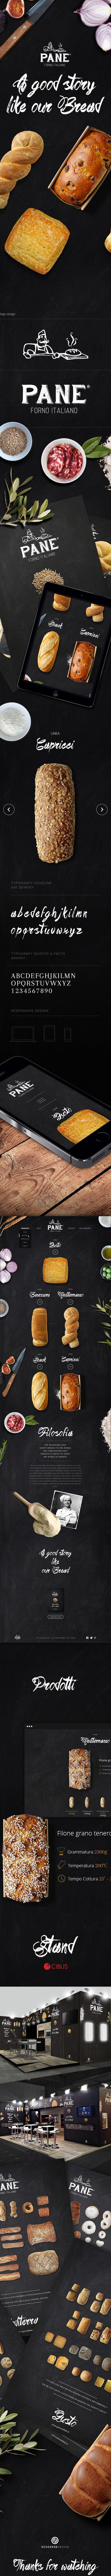 Pane | Forno Italiano by Scozzese Design, via Behance